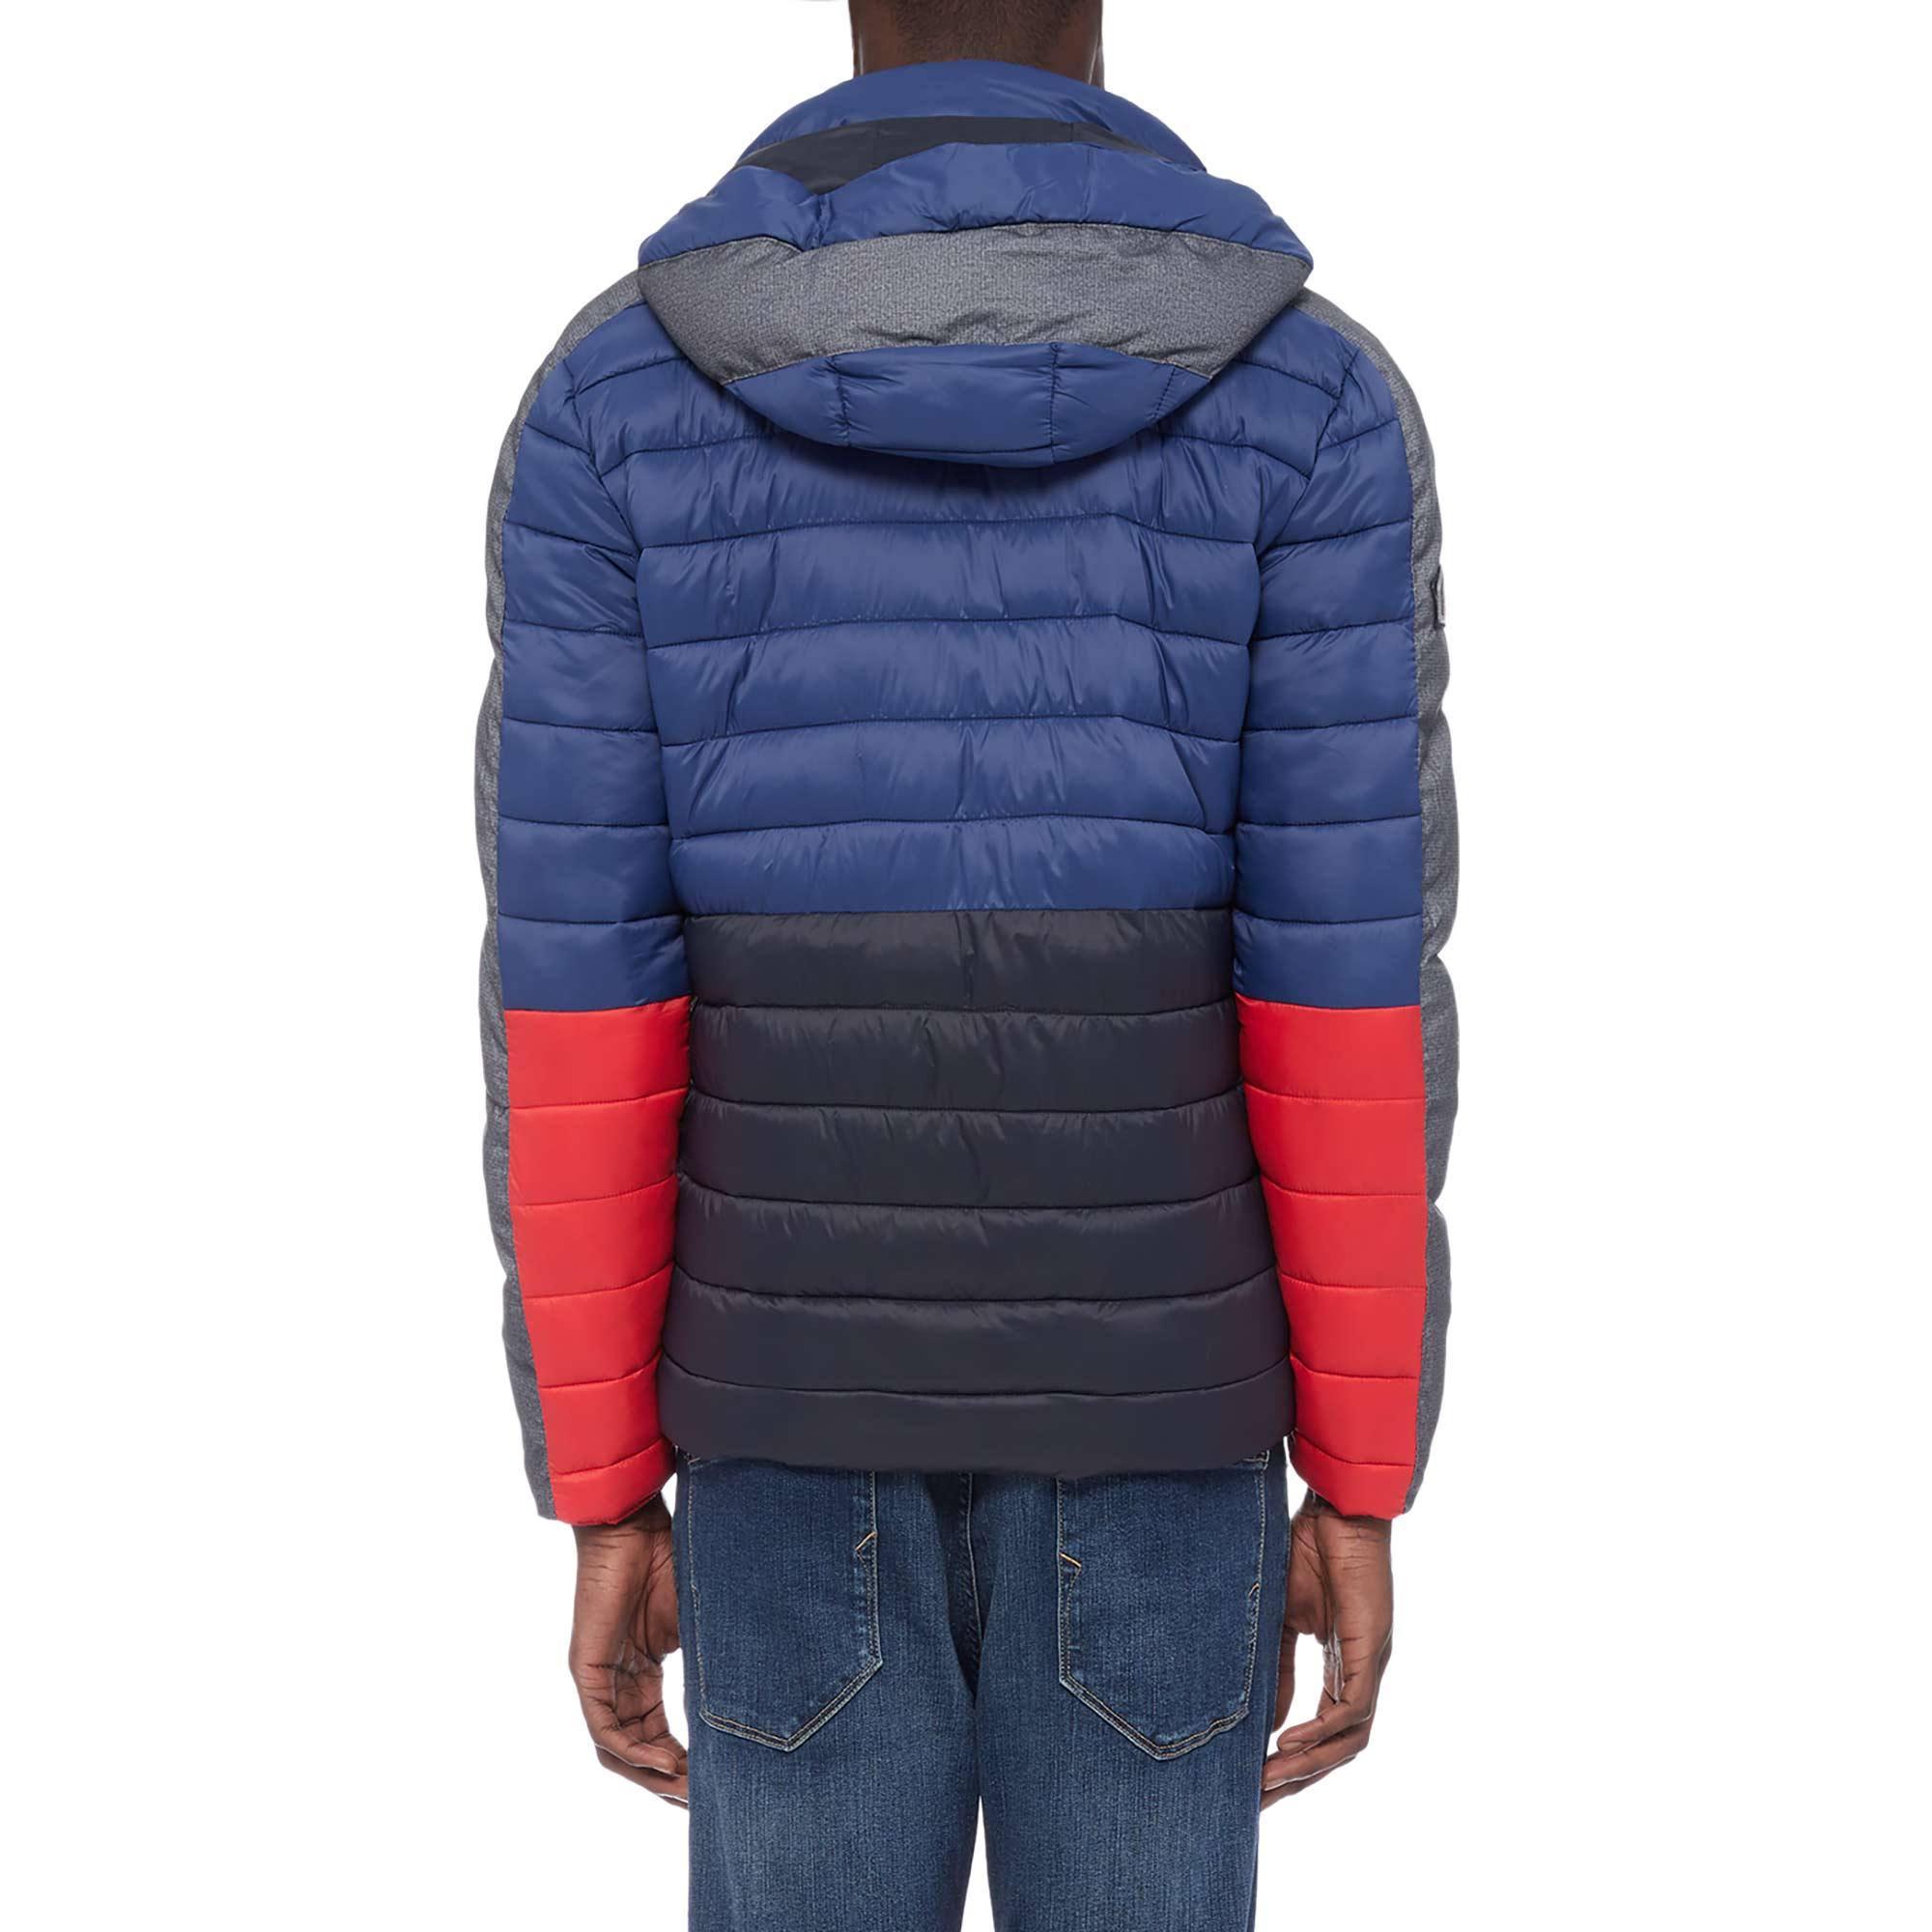 Fuji Superdry Jacket Color Harbournavy Block rxwrqB6